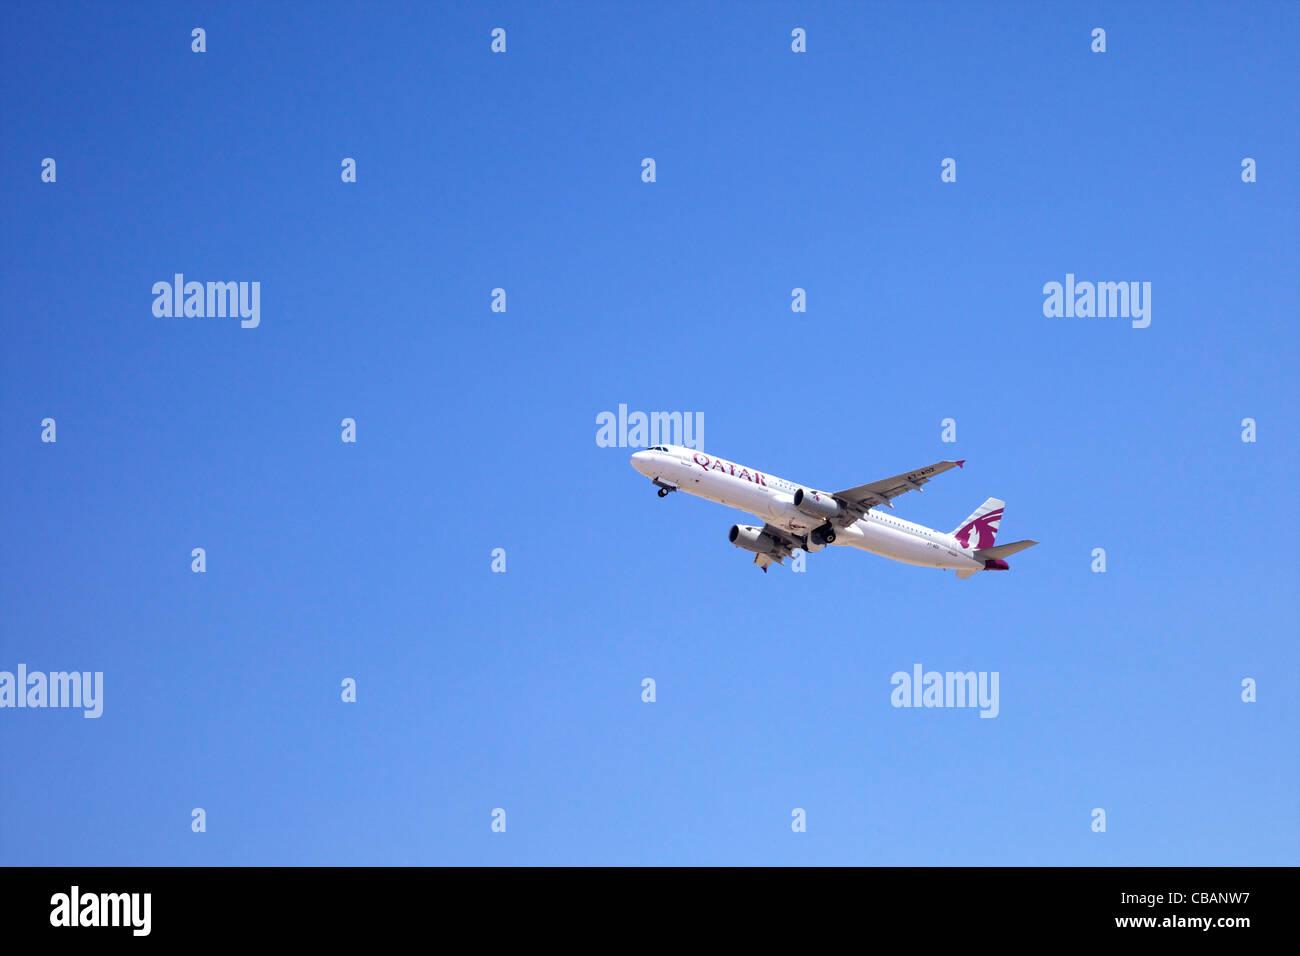 Avion de Qatar Airbus A330 en vol peu après le décollage de l'Aéroport International de Doha Banque D'Images